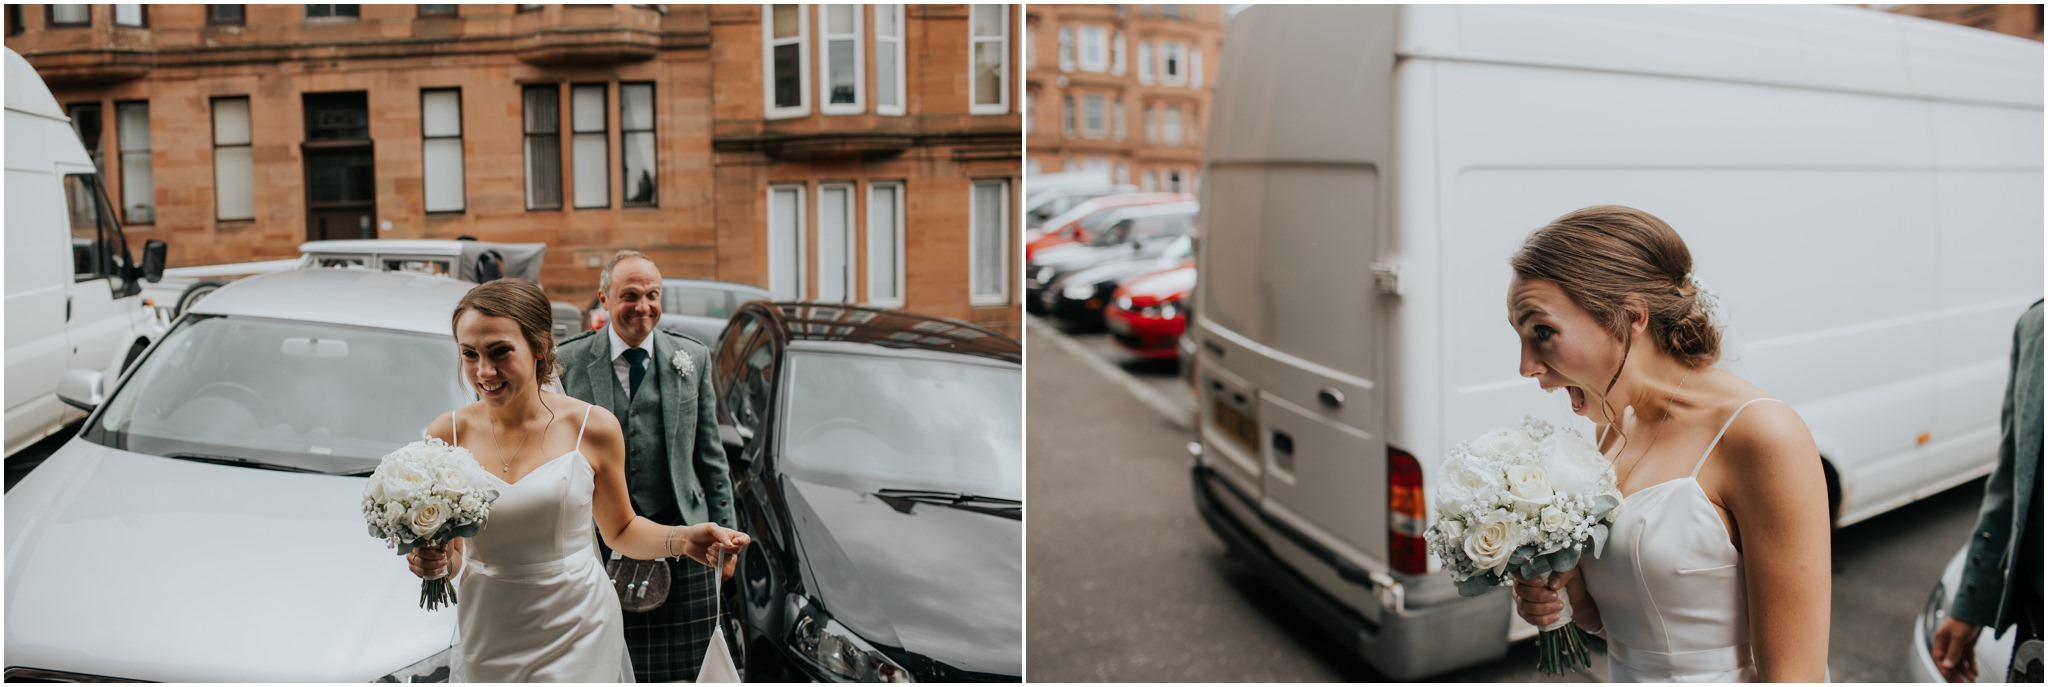 Photography 78 - Glasgow Wedding Photographer - Jordan & Abi - The Waterside Hotel, West Kilbride_0042.jpg